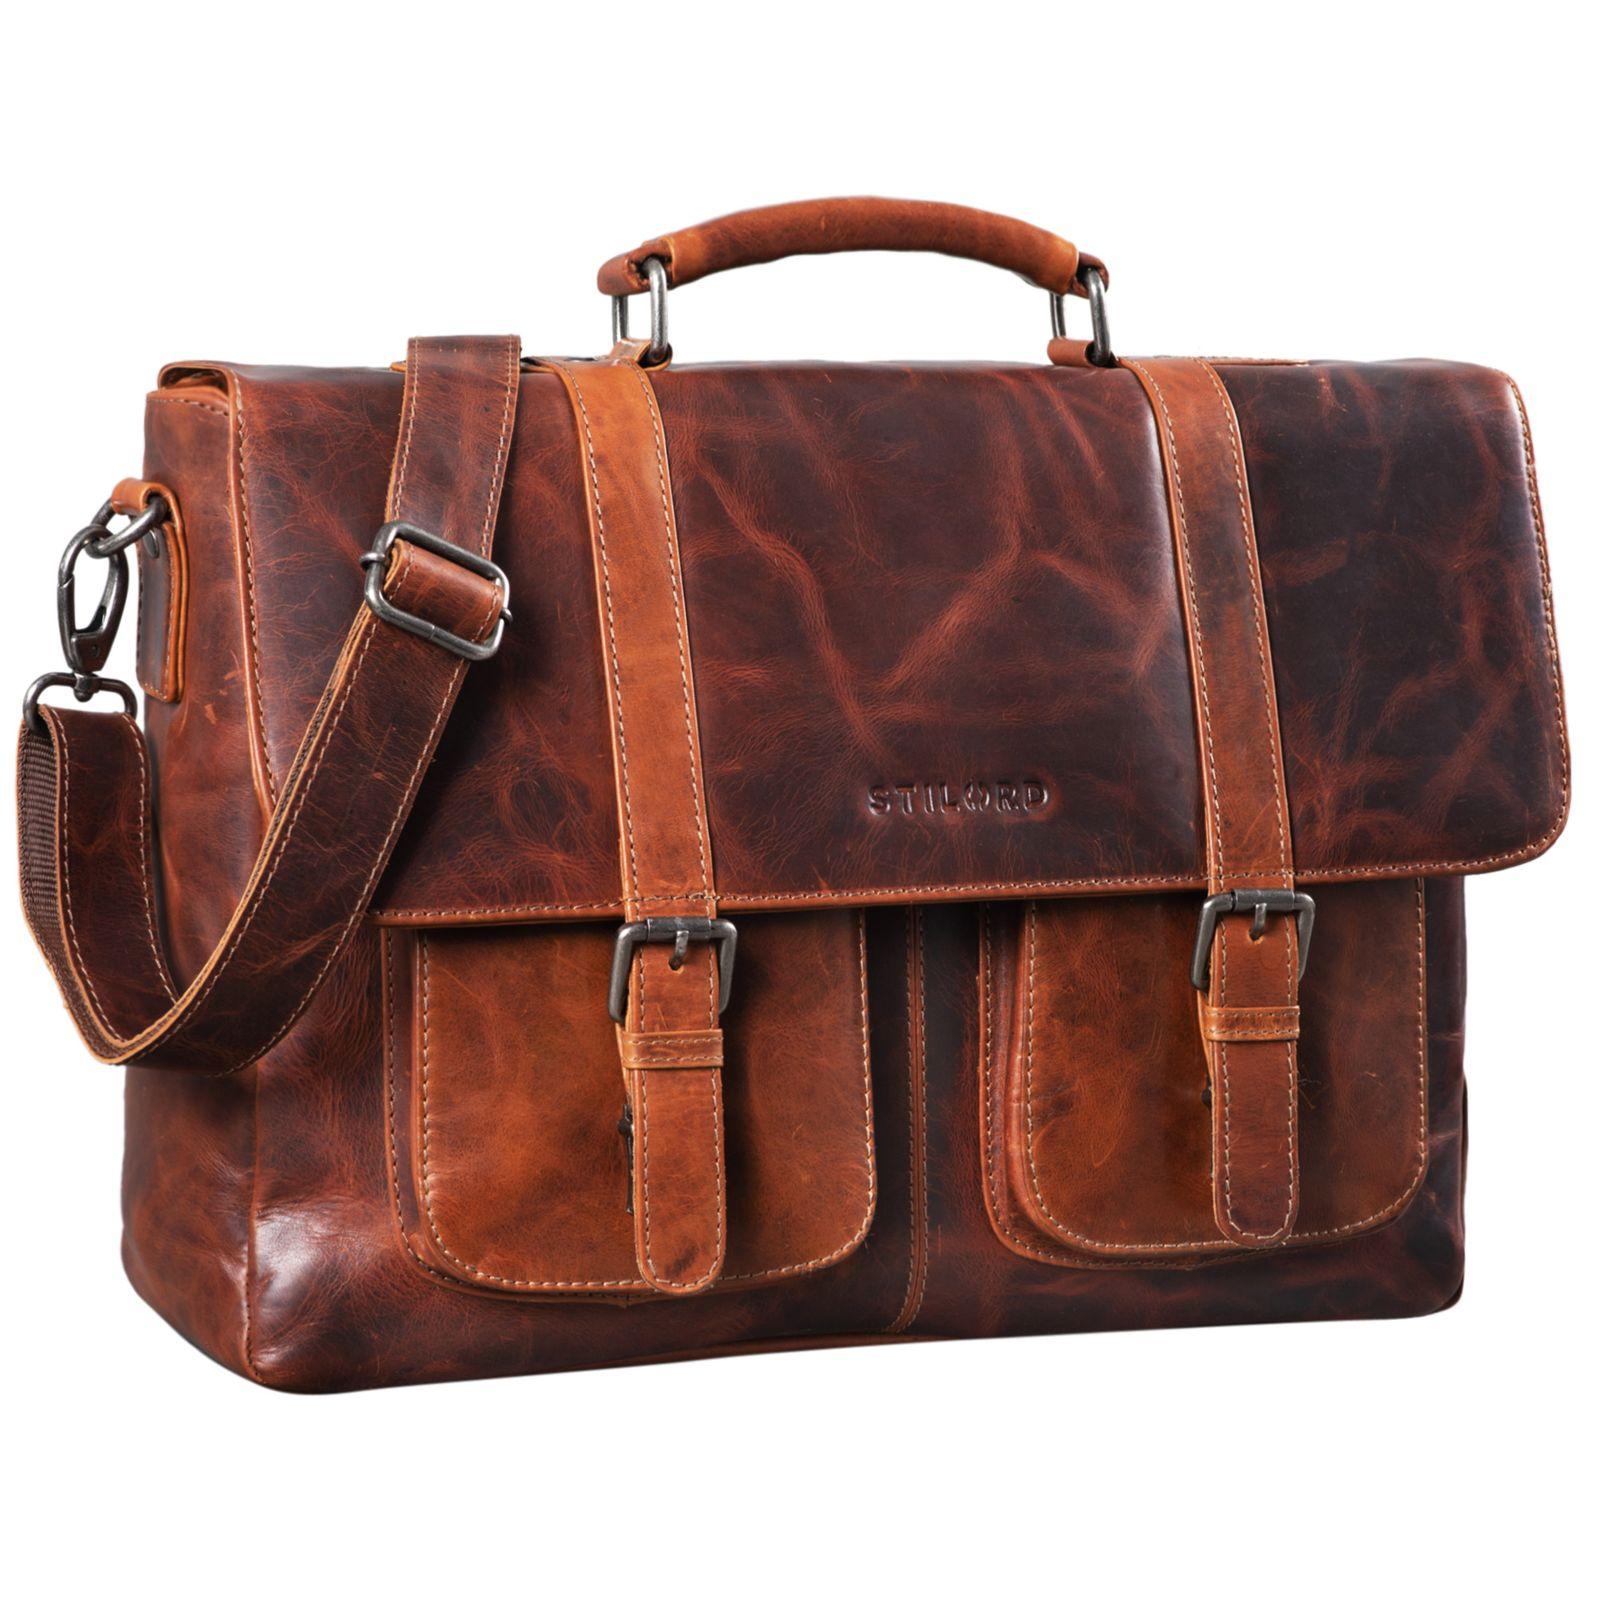 cartable cuir vintage Stilord Pontius